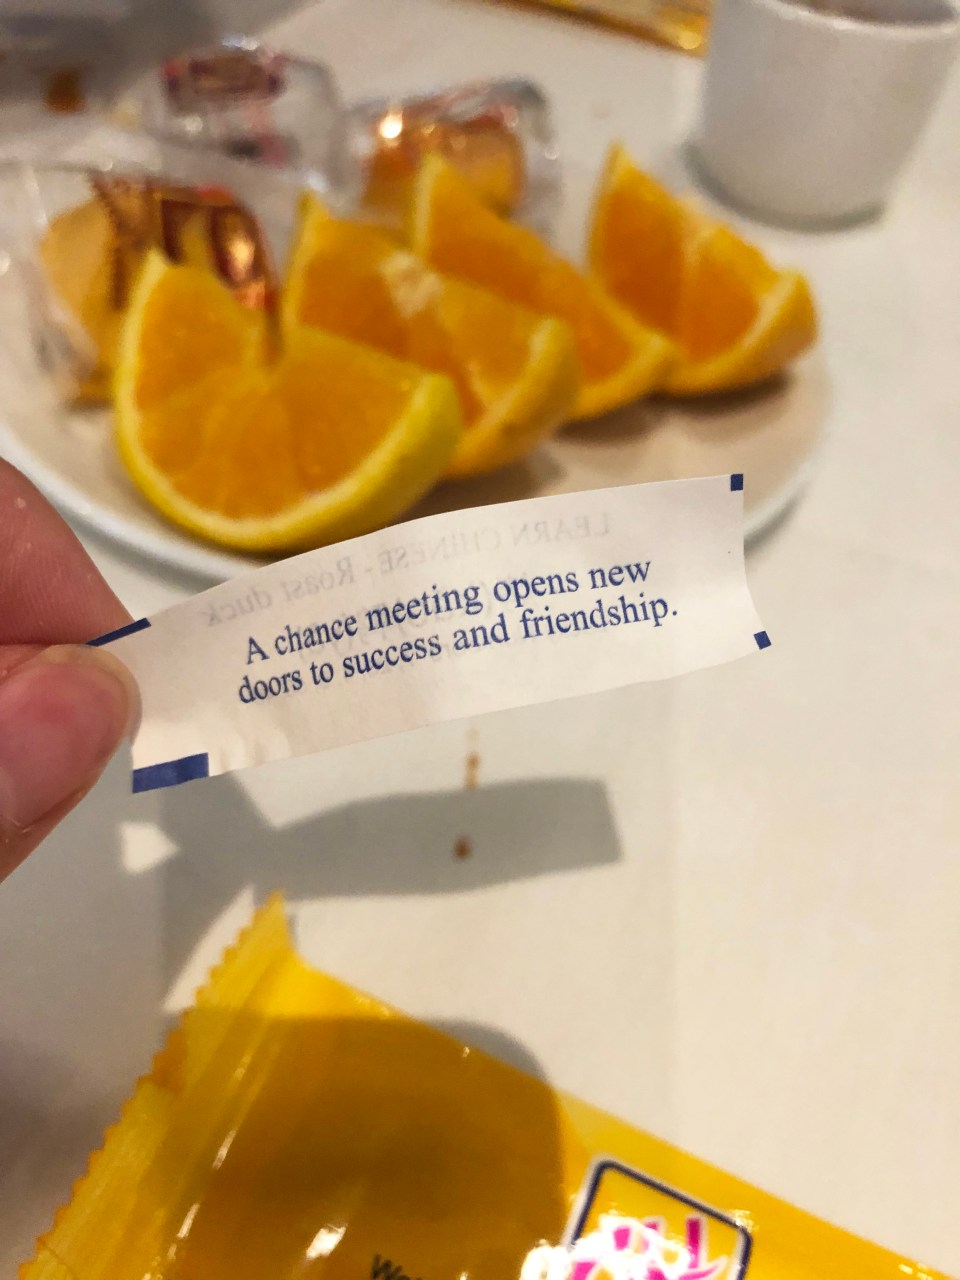 Chef Yang's 46 - Fortune Cookies & Oranges